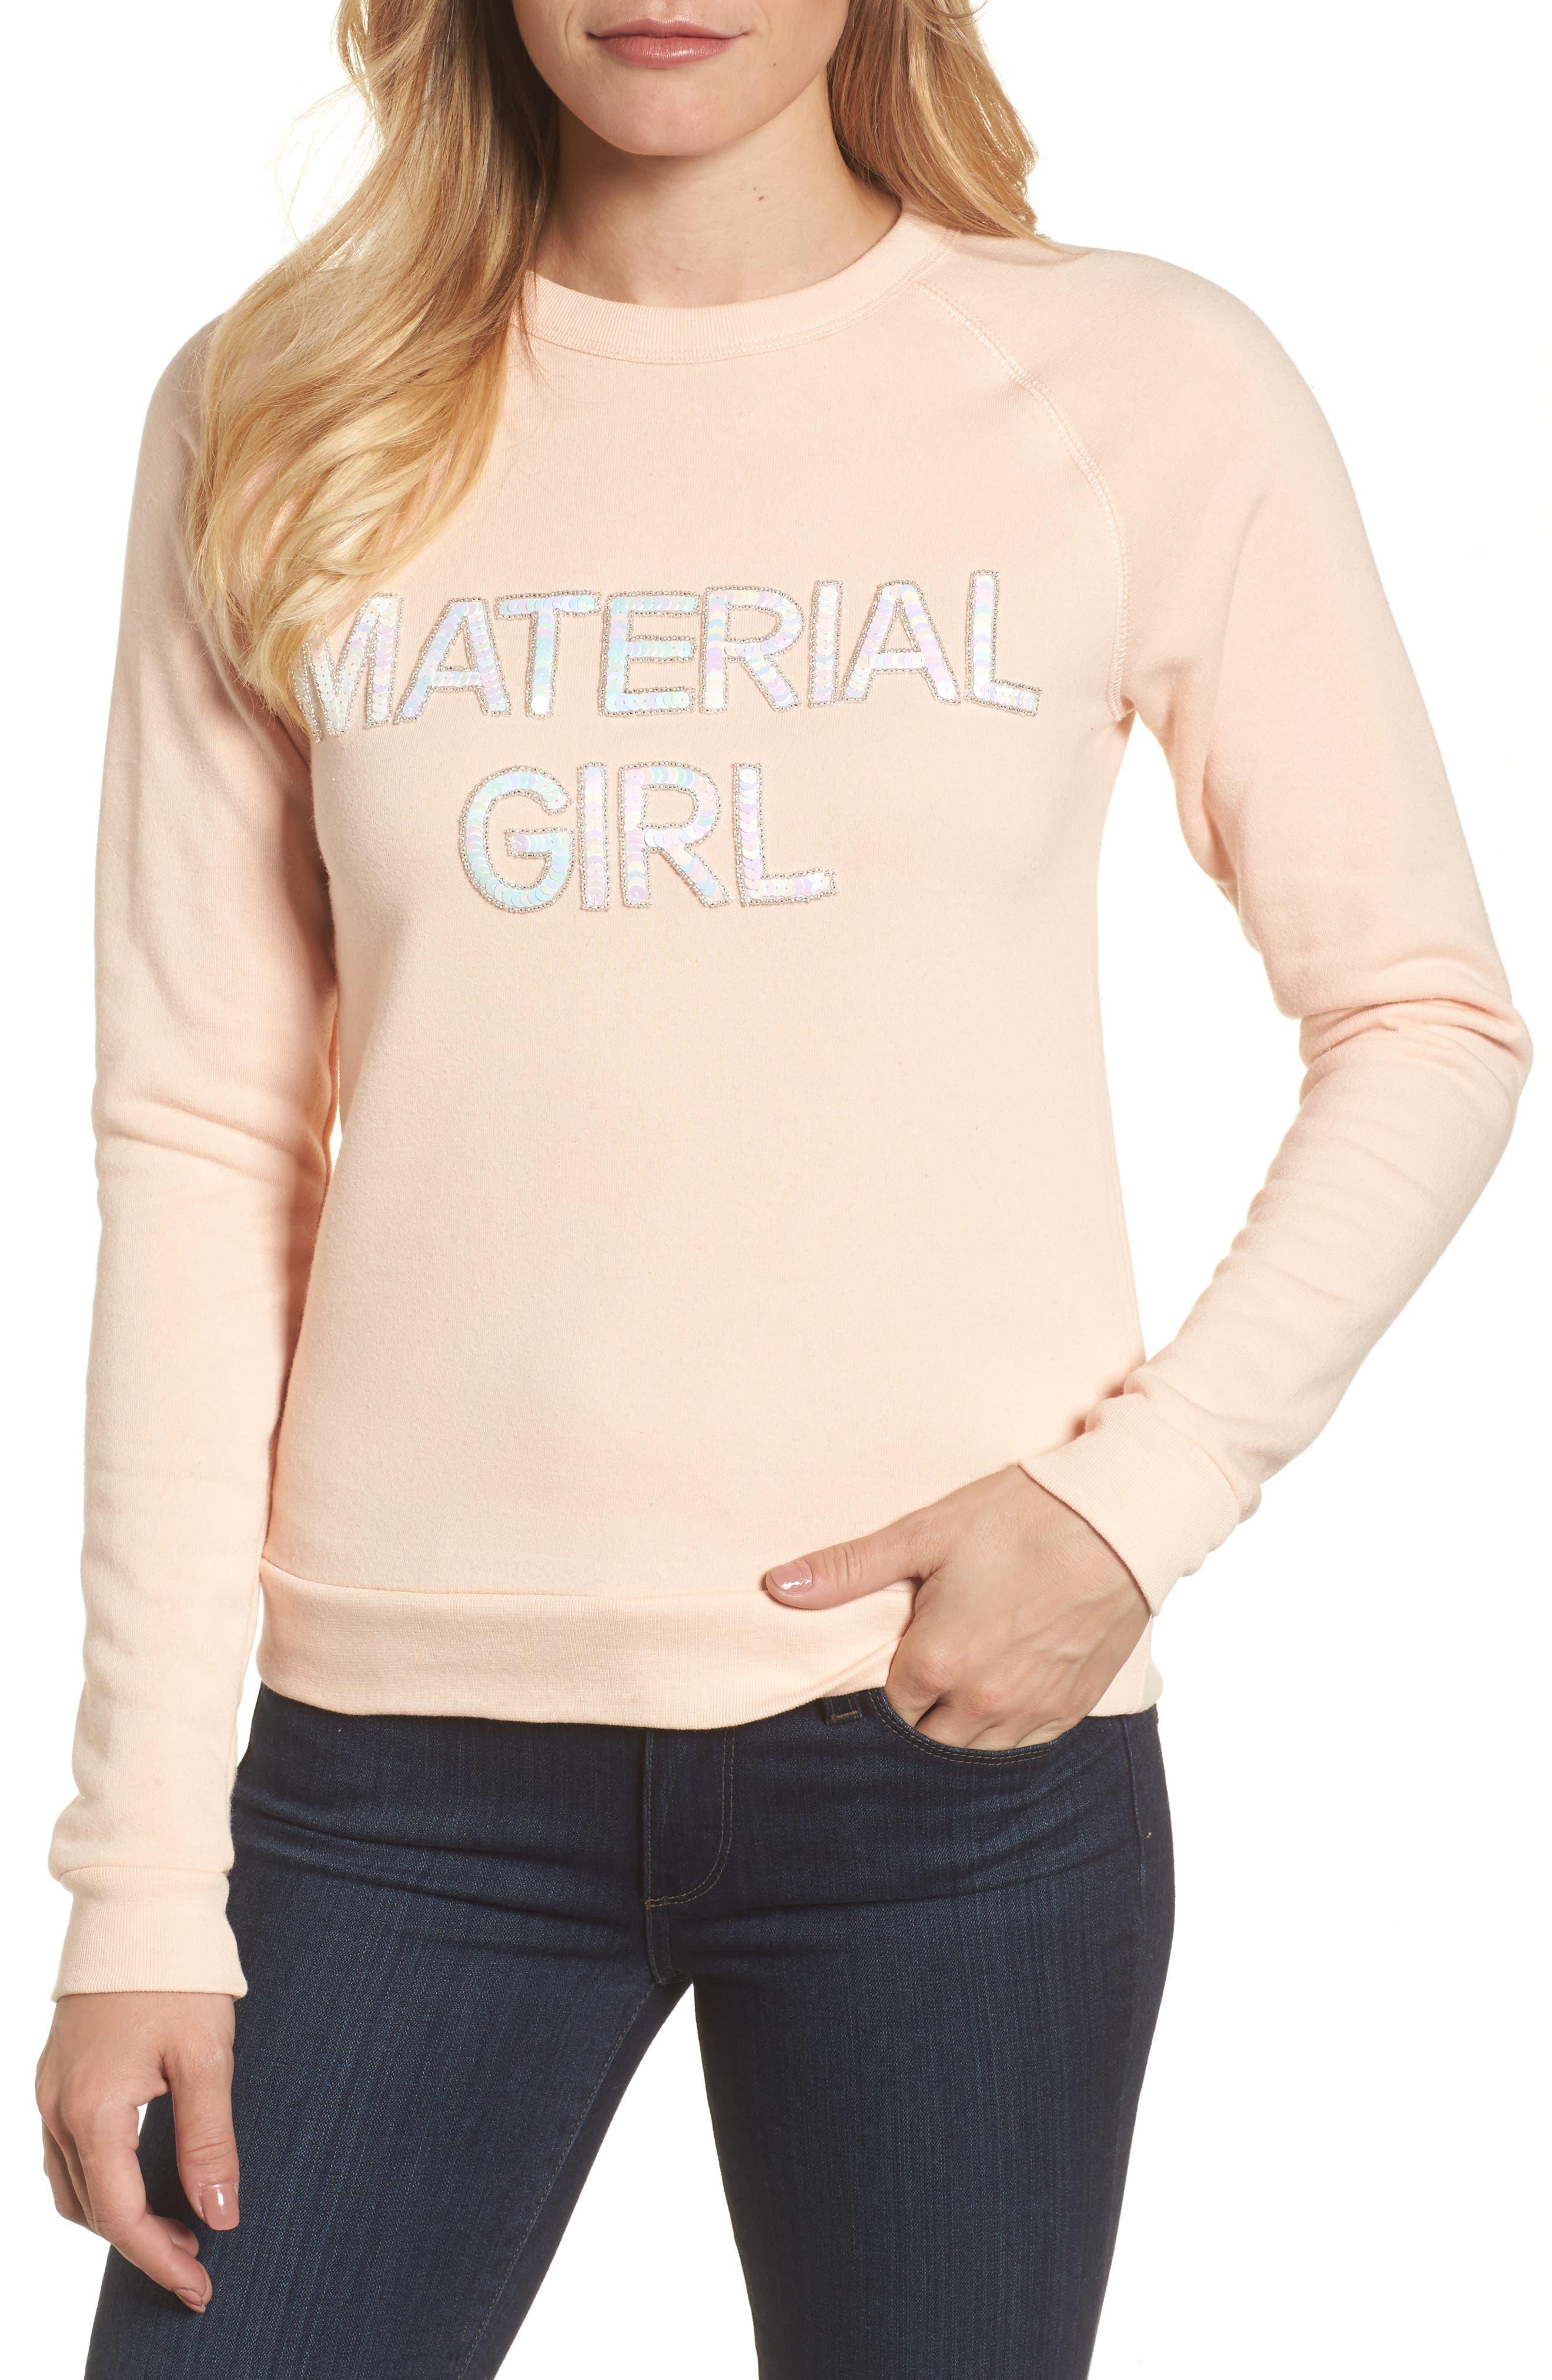 Material Girl Sweatshirt,                             Main thumbnail 1, color,                             Blush